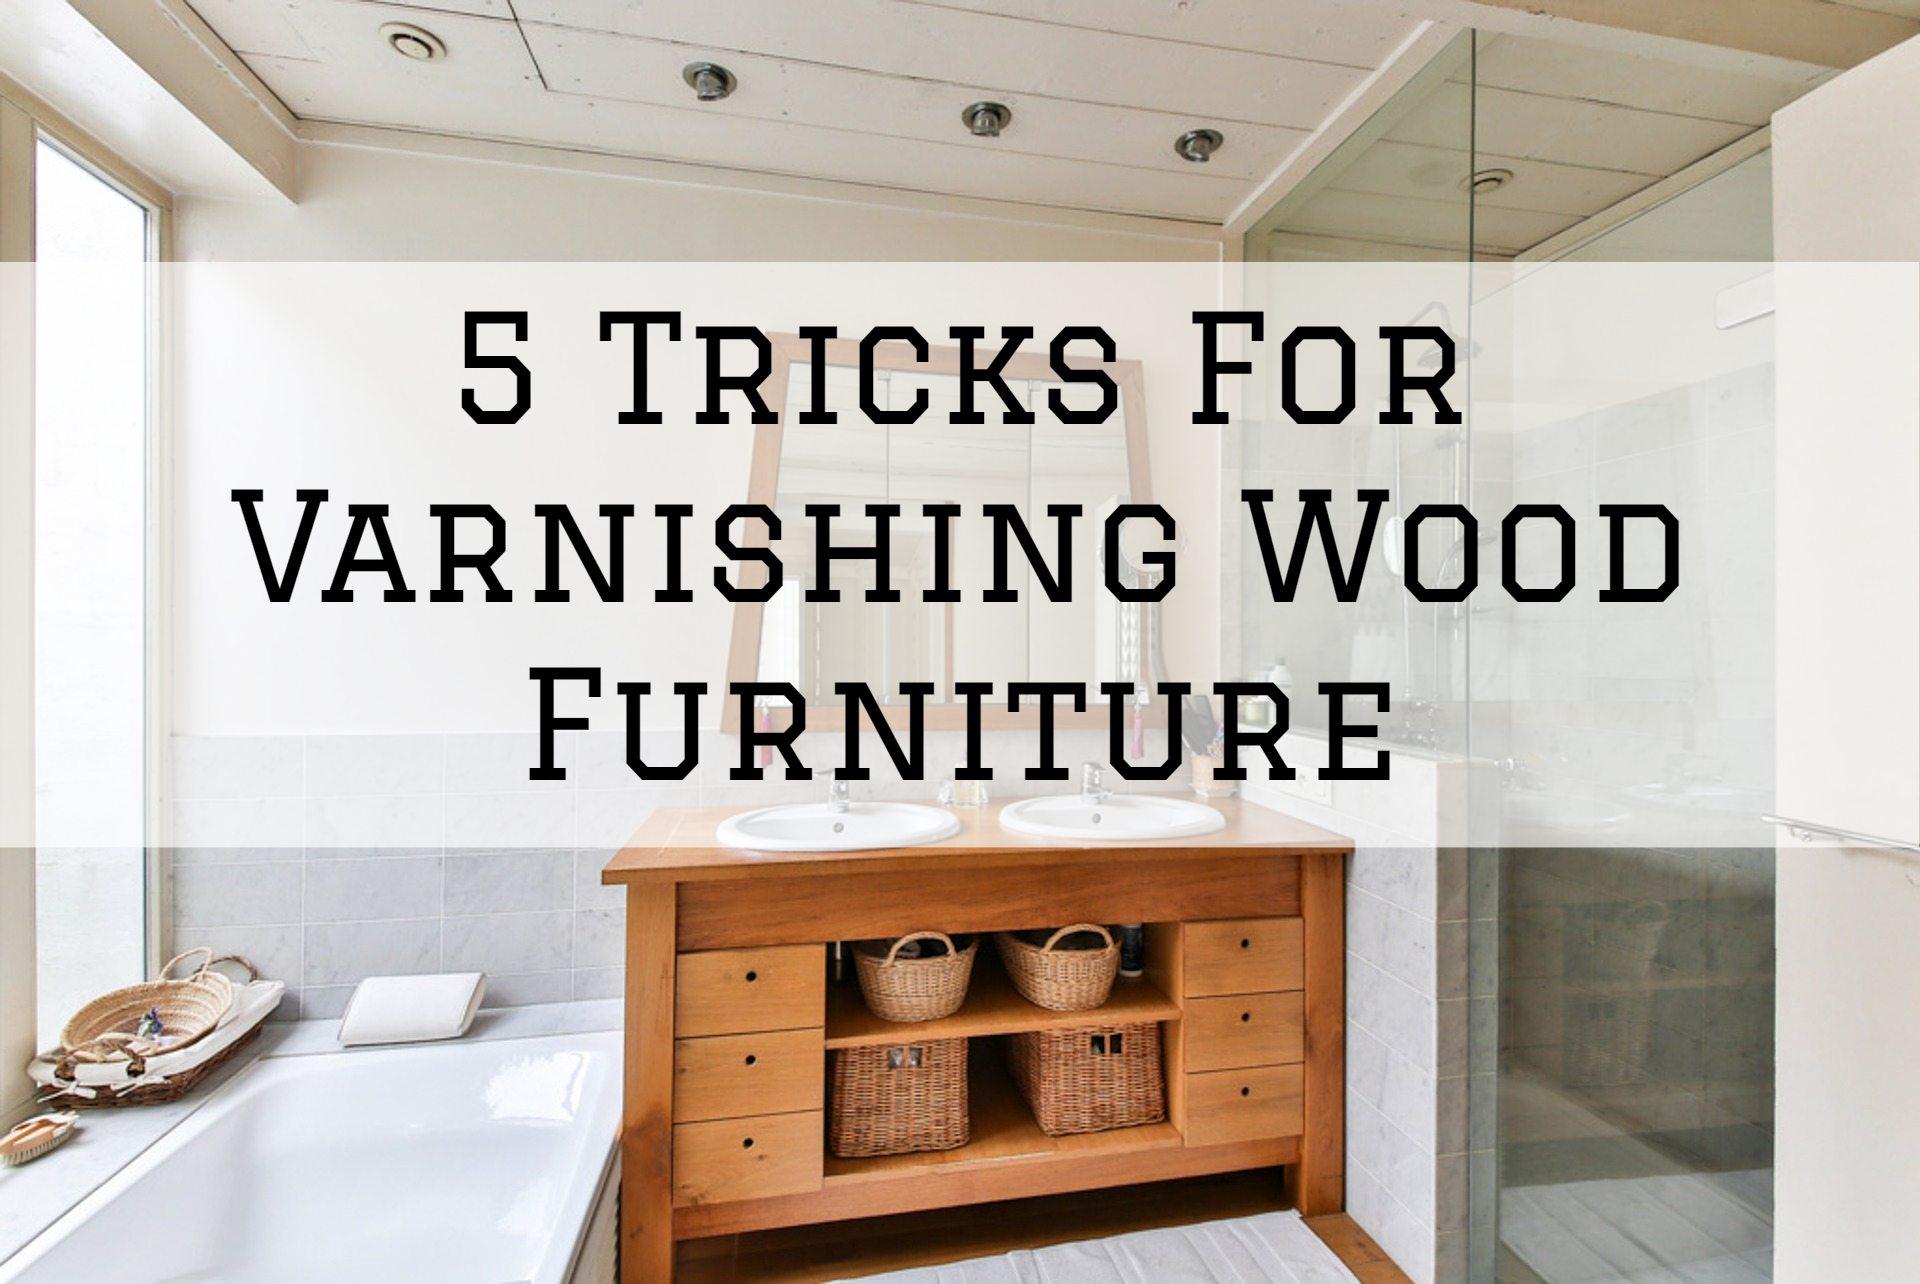 5 Tricks For Varnishing Wood Furniture in Omaha, NE